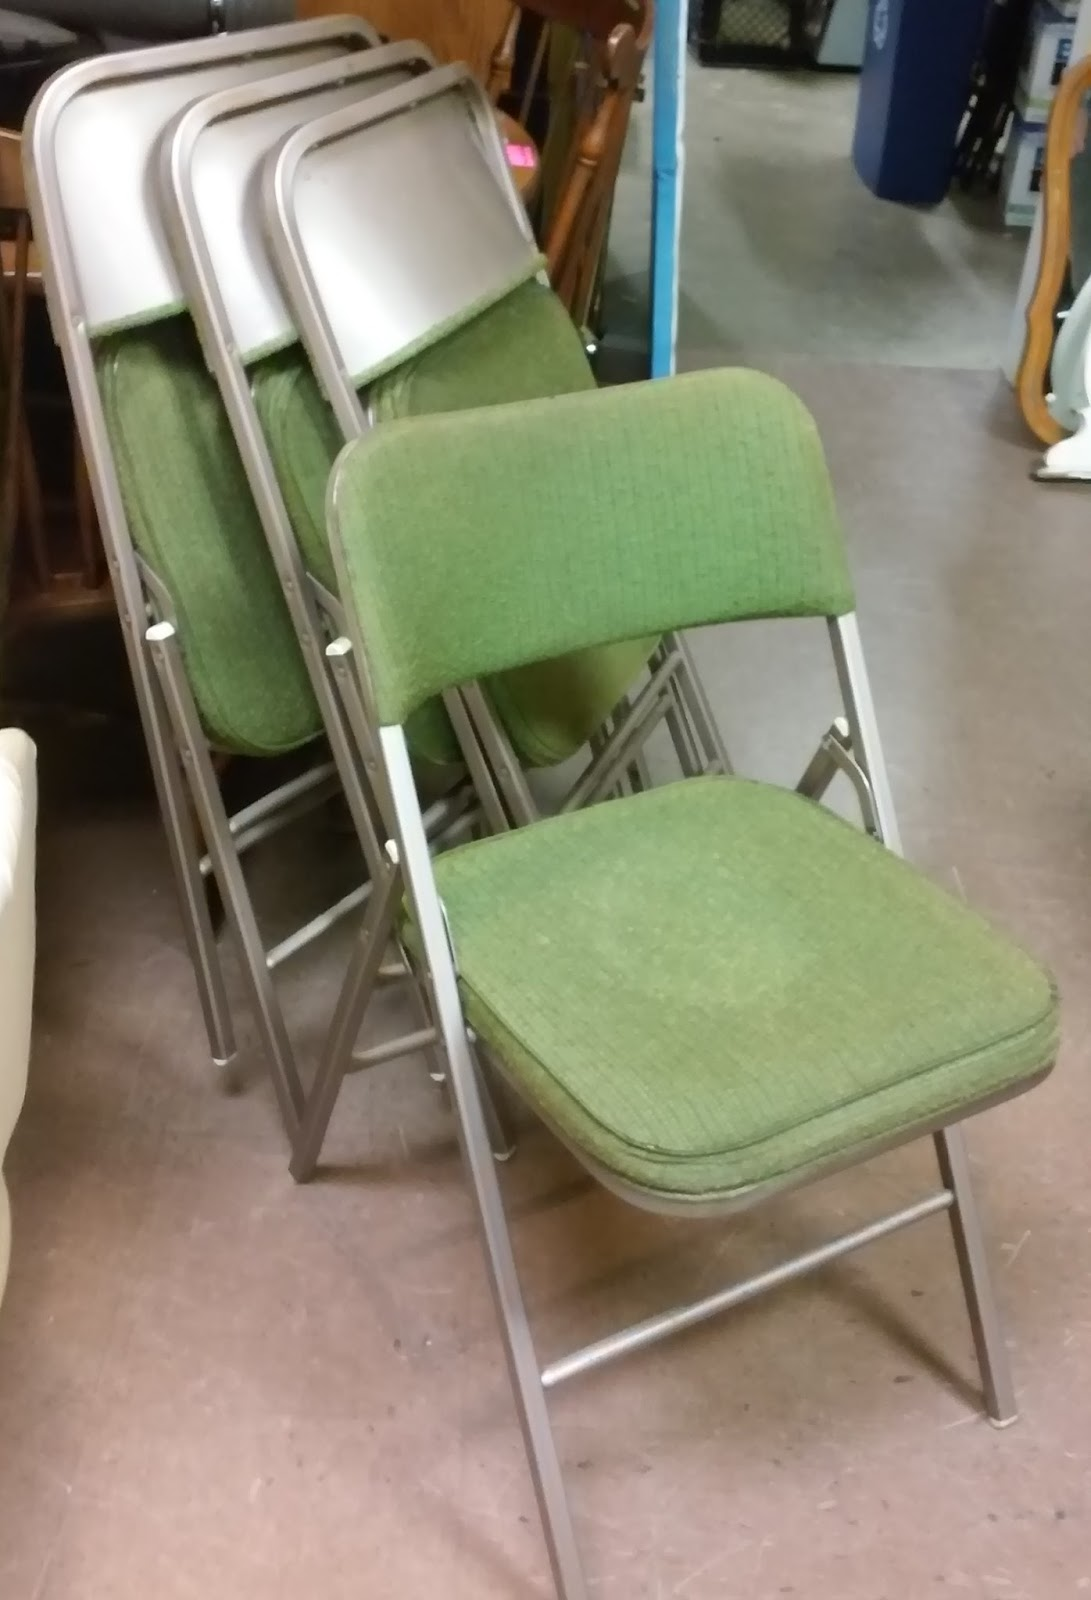 Surprising Uhuru Furniture Collectibles Sold Bargain Buy Cjindustries Chair Design For Home Cjindustriesco